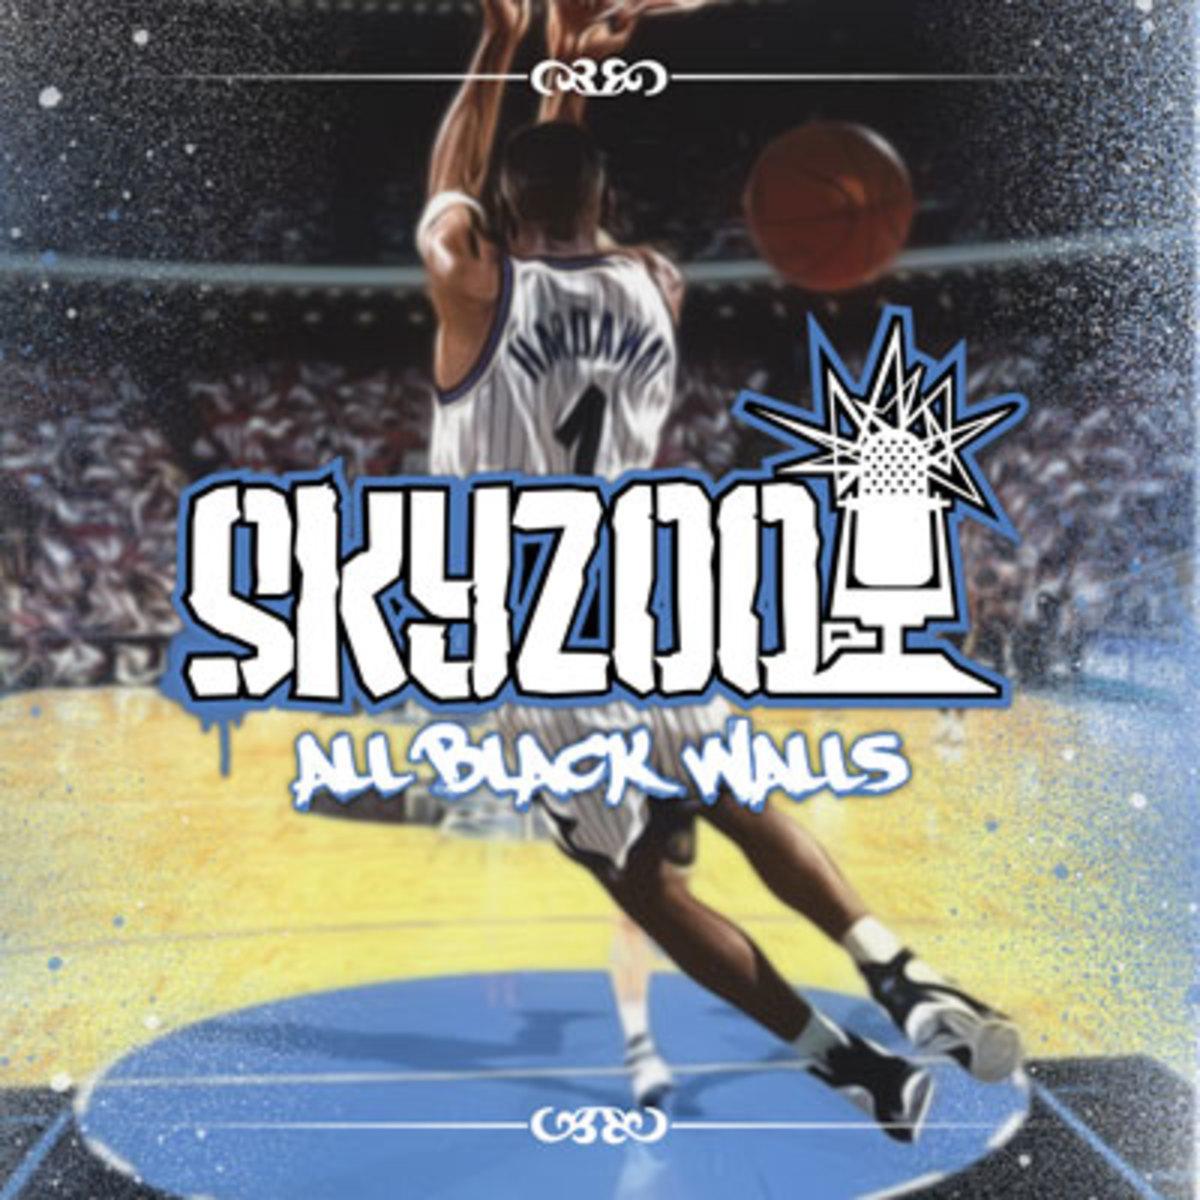 skyzoo-allblackwalls.jpg